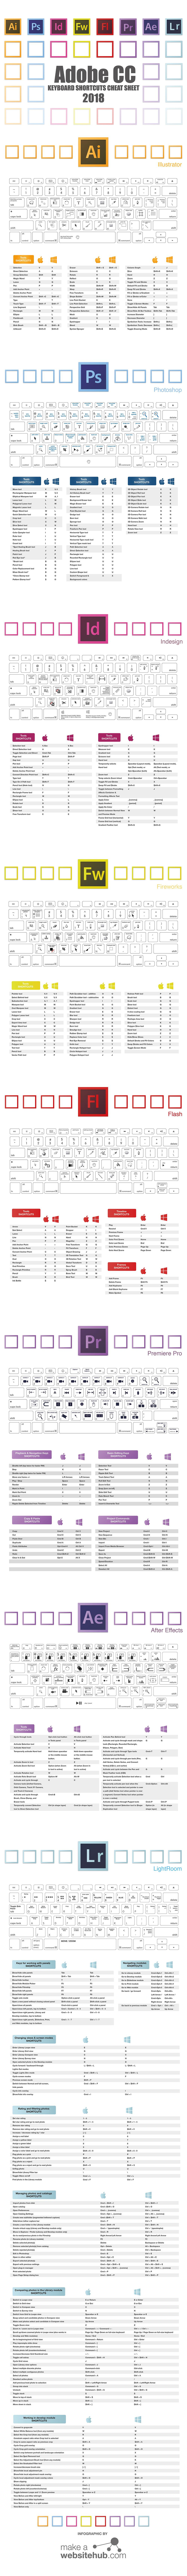 Adobe CC shortcut cheat sheet